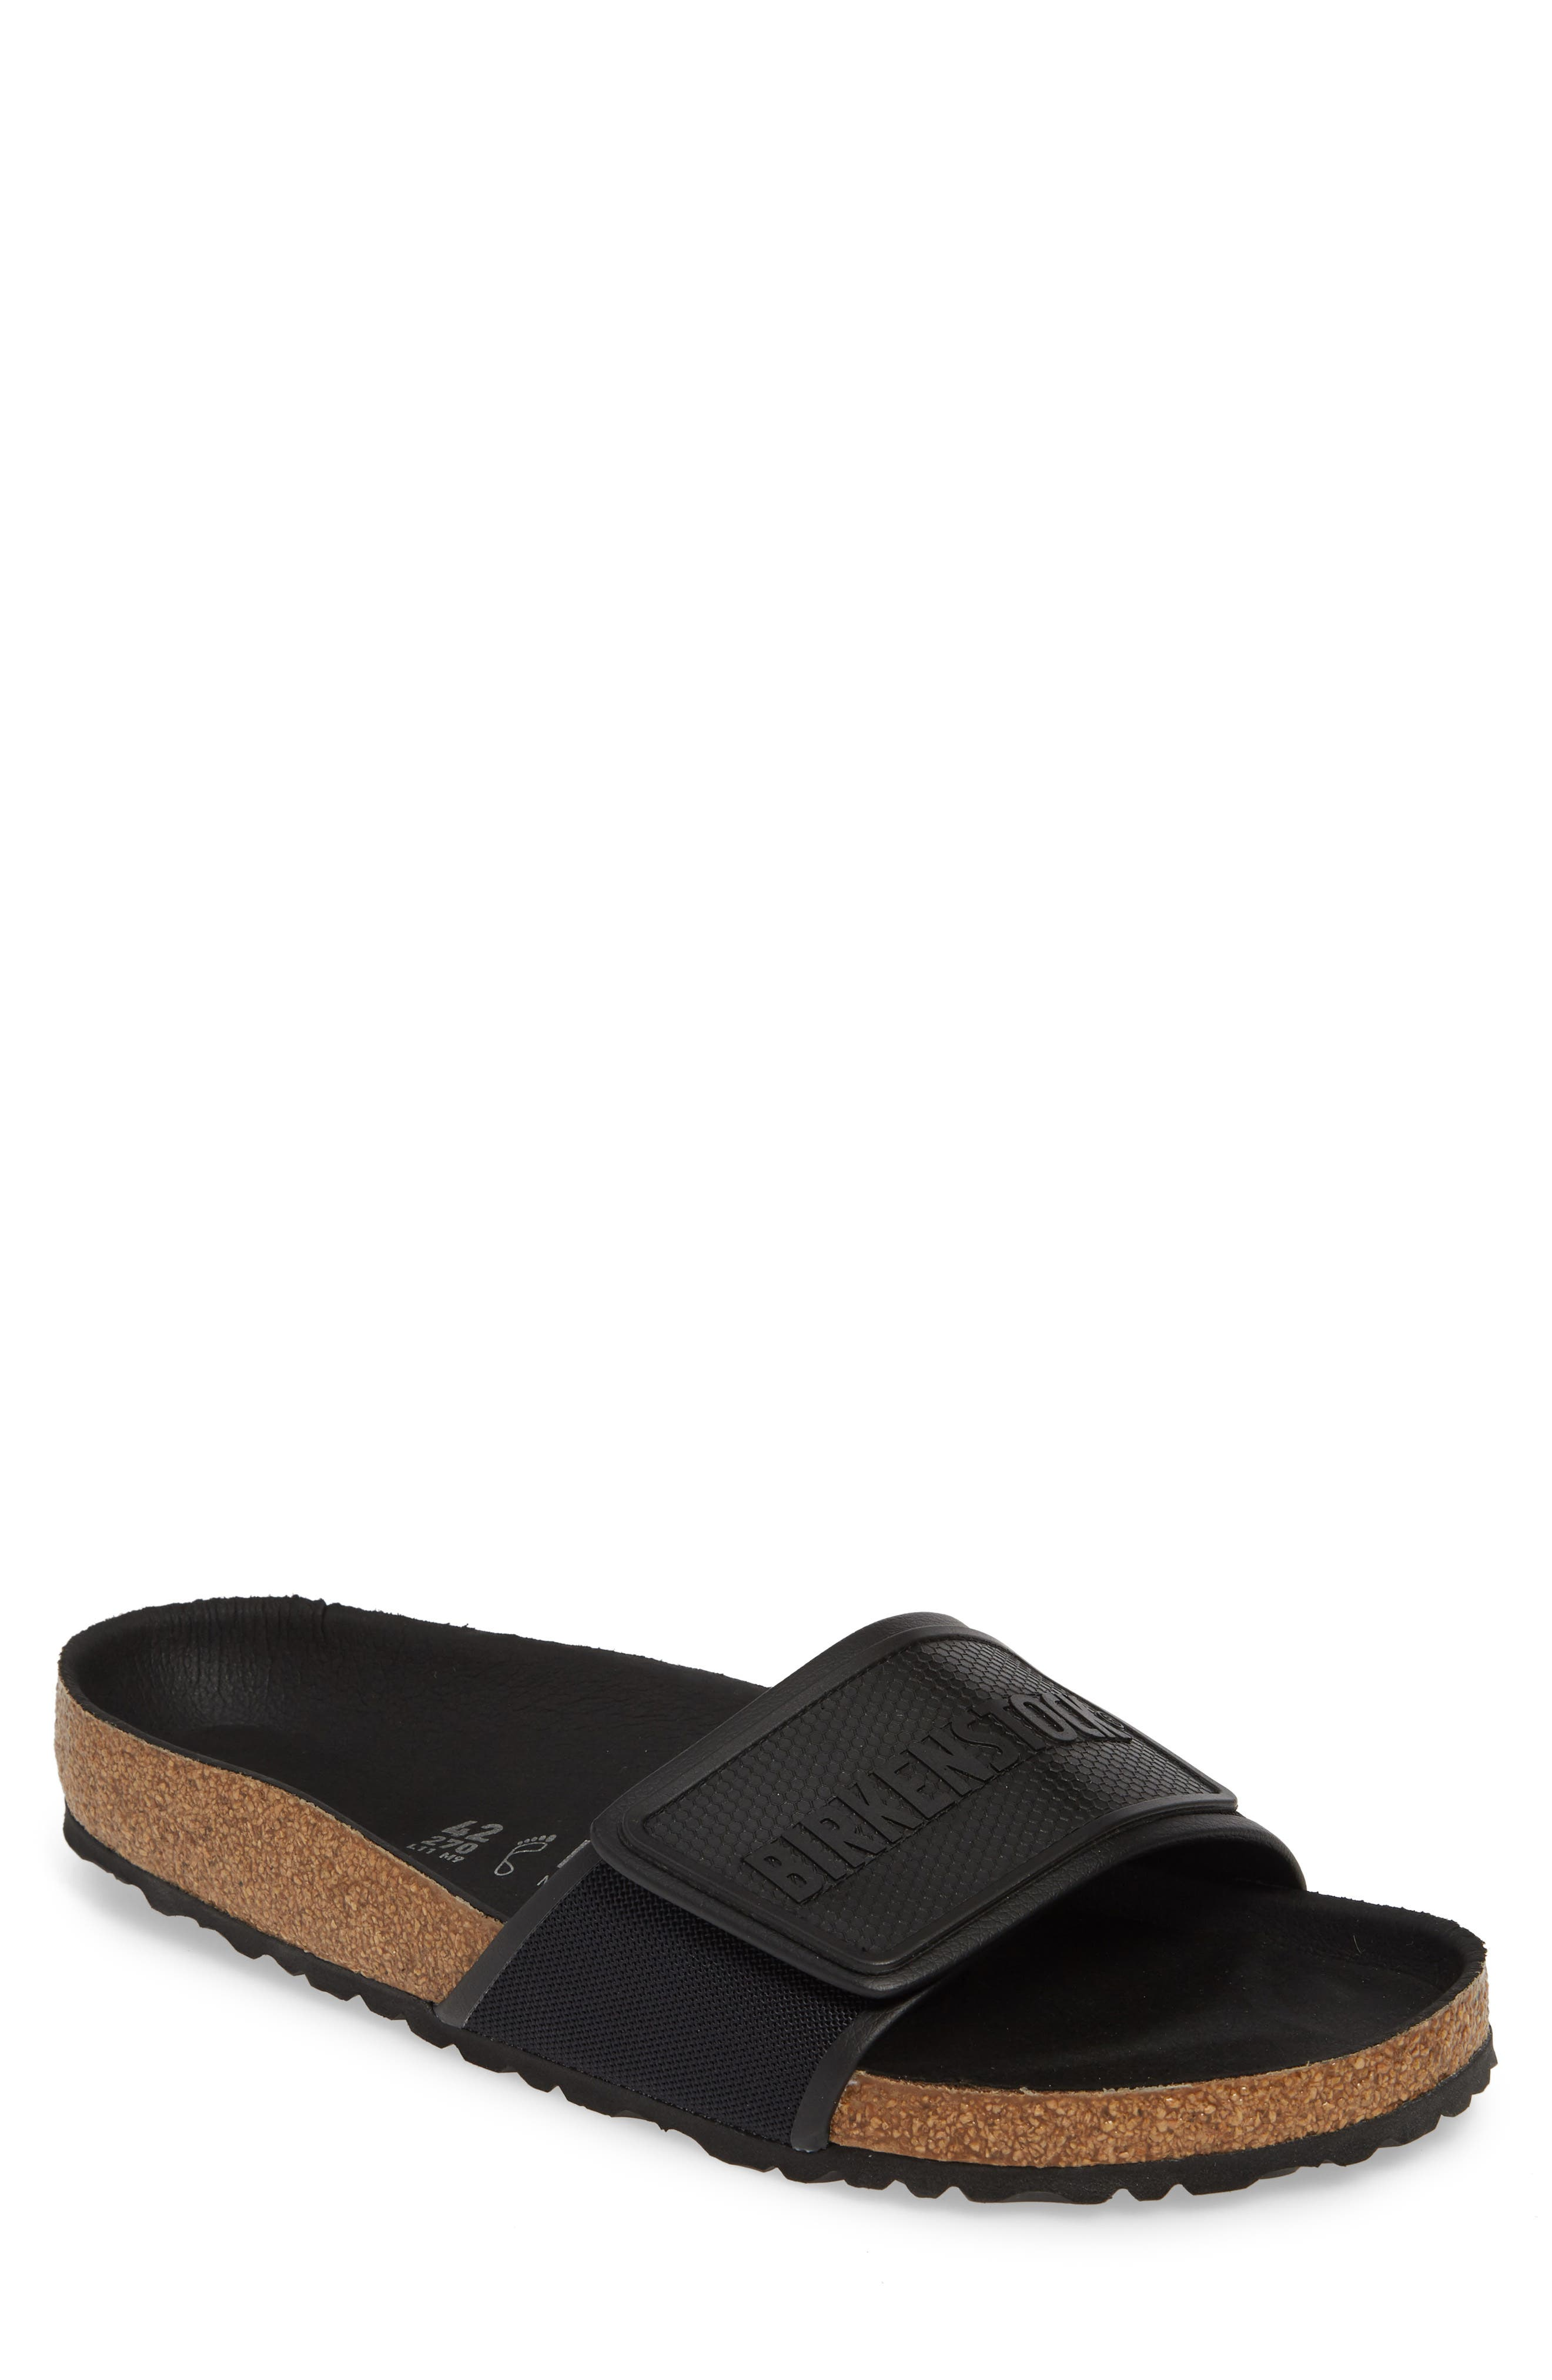 Birkenstock Tema Slide Sandal,9.5 - Black